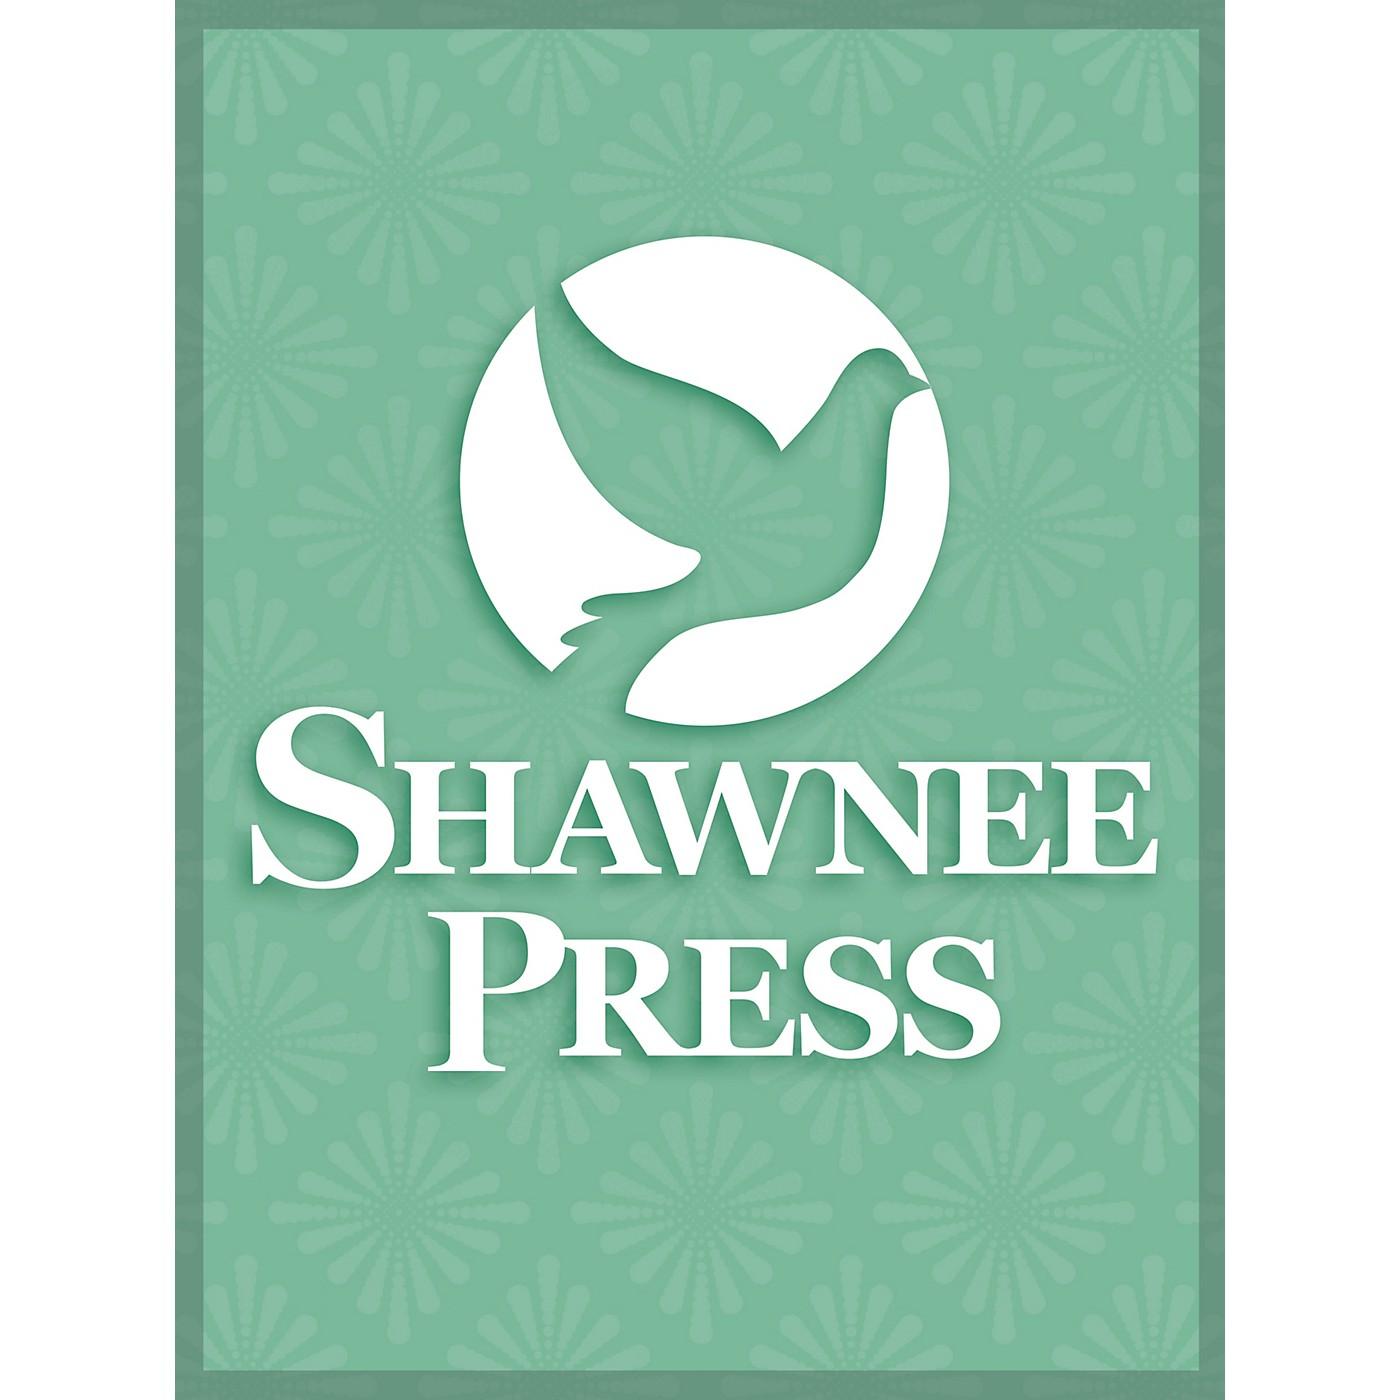 Shawnee Press Le P'ing (3-5 Octaves of Handbells) Arranged by Betty Garee thumbnail